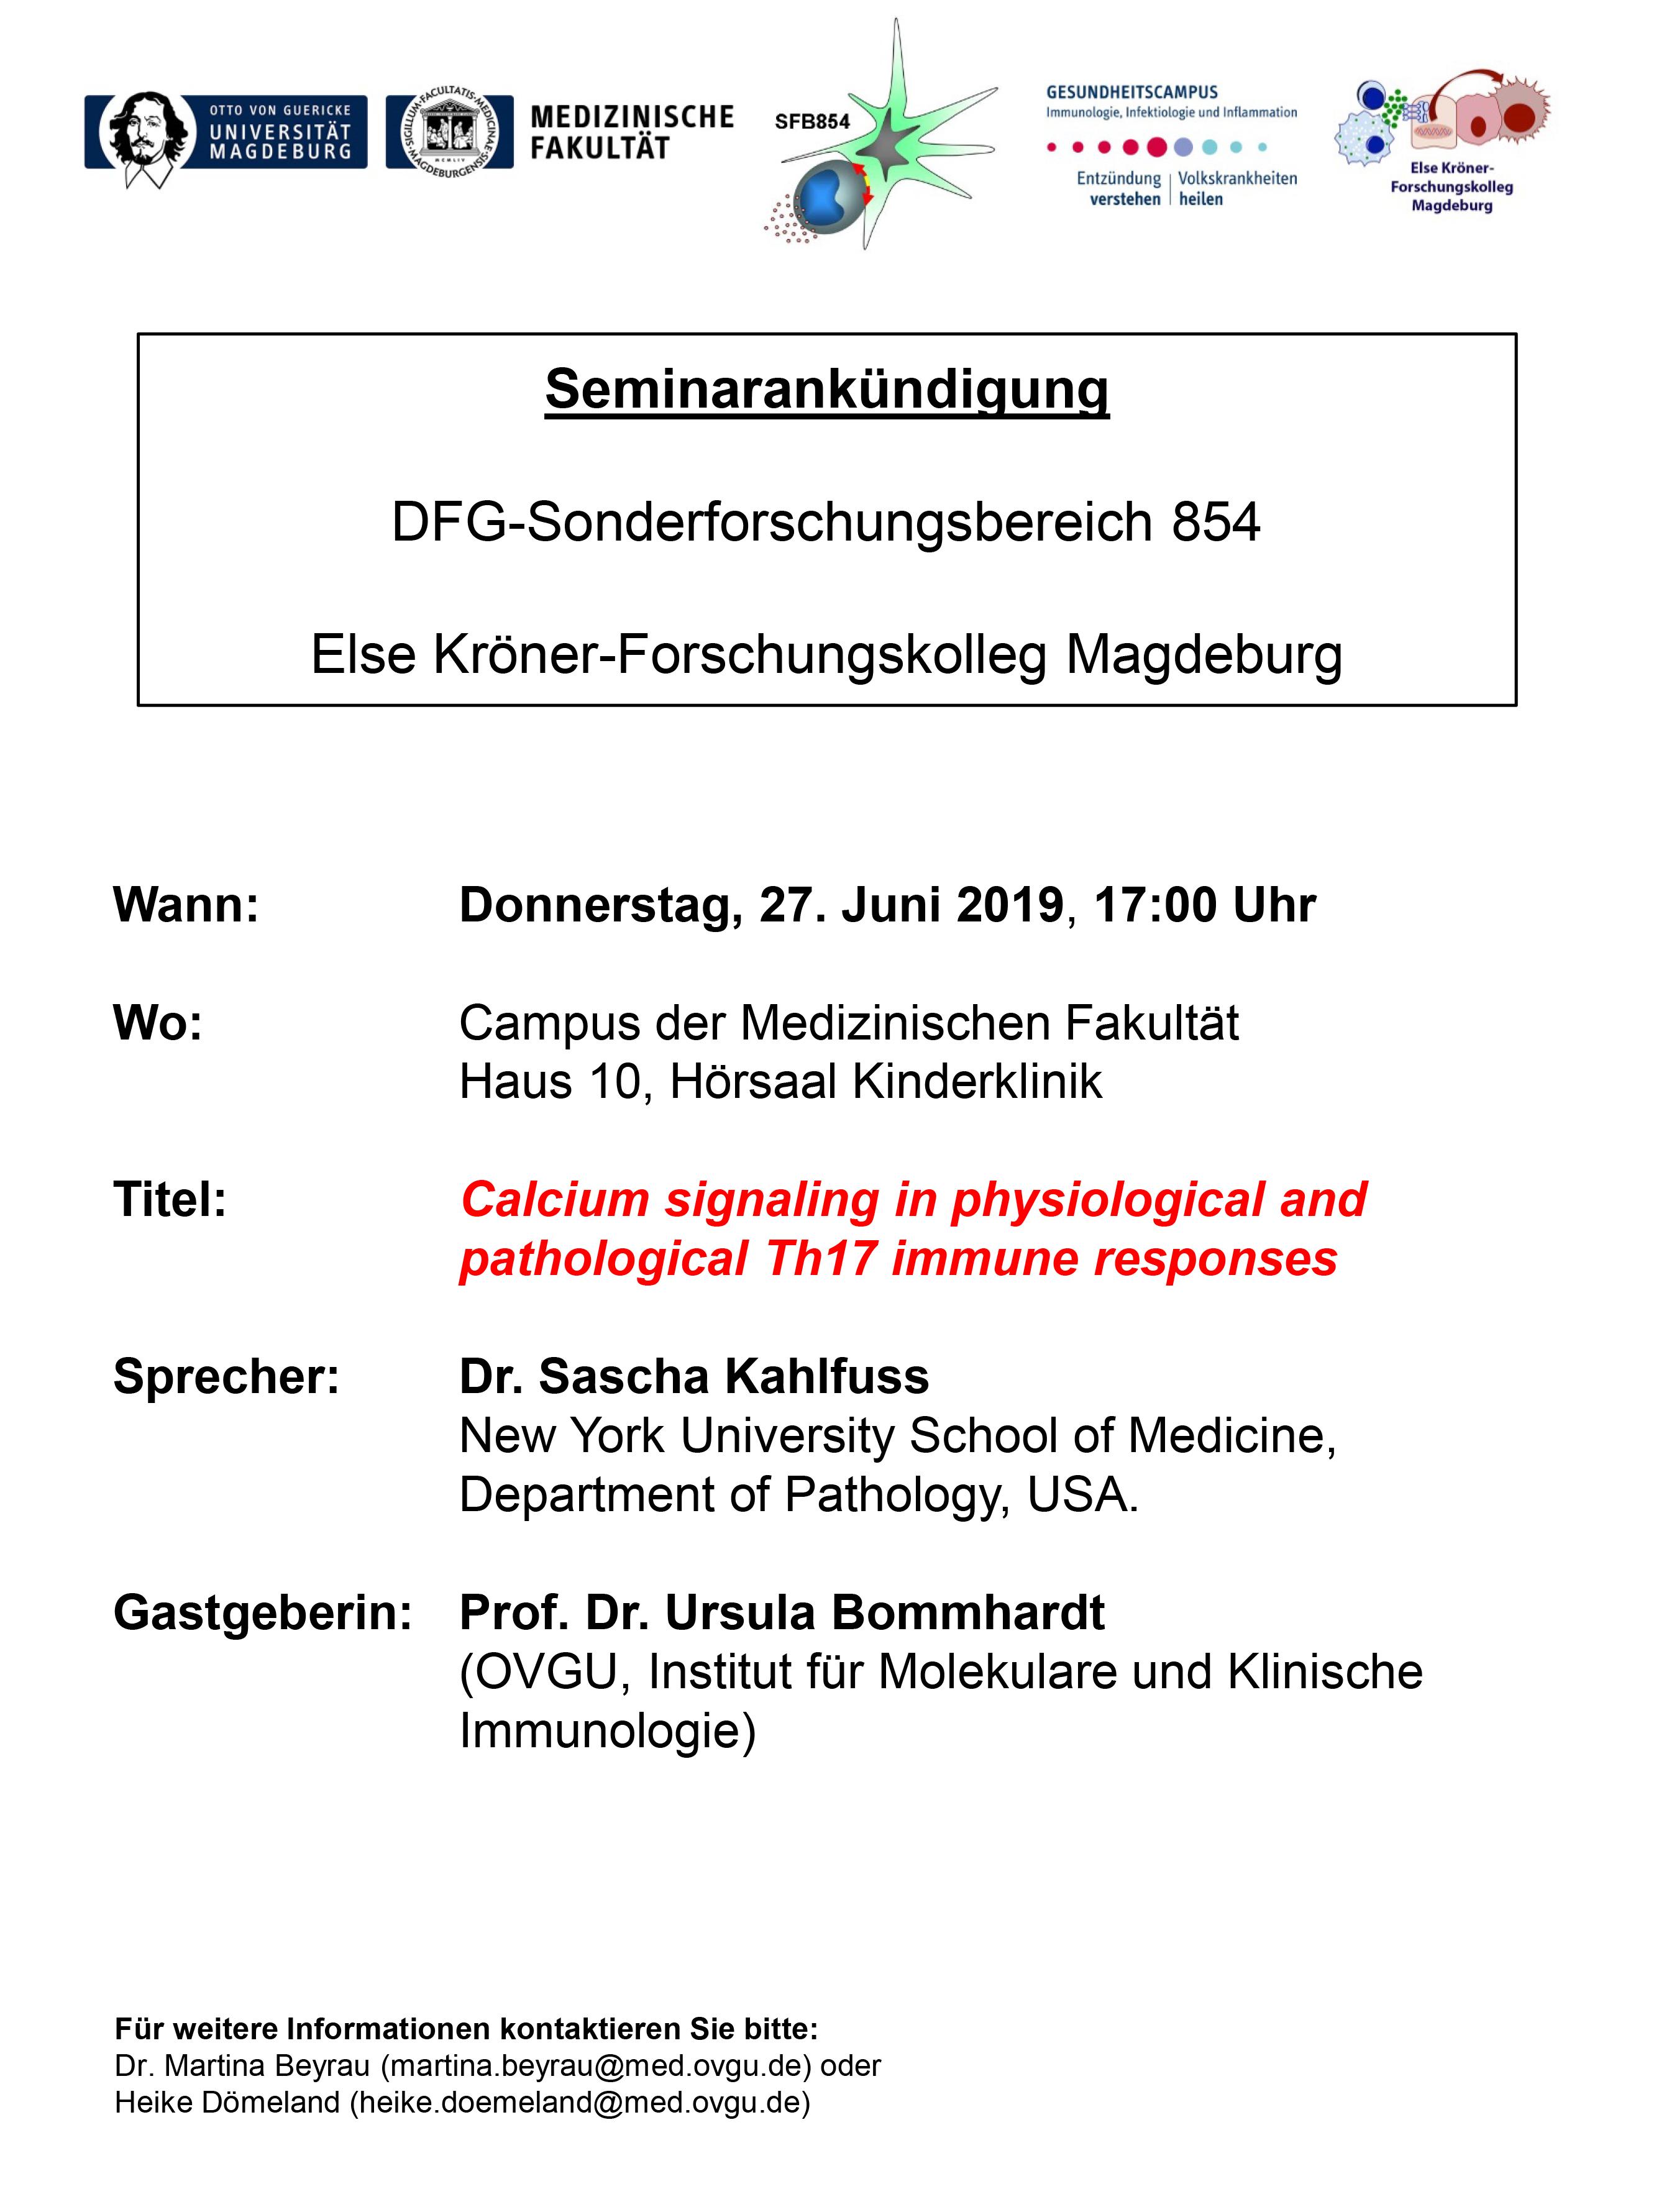 CRC 854 Seminar: Calcium signaling in physiological and pathological Th17 immune responses @ Campus der Medical Fakulty House 10, Hörsaal Kinderklinik